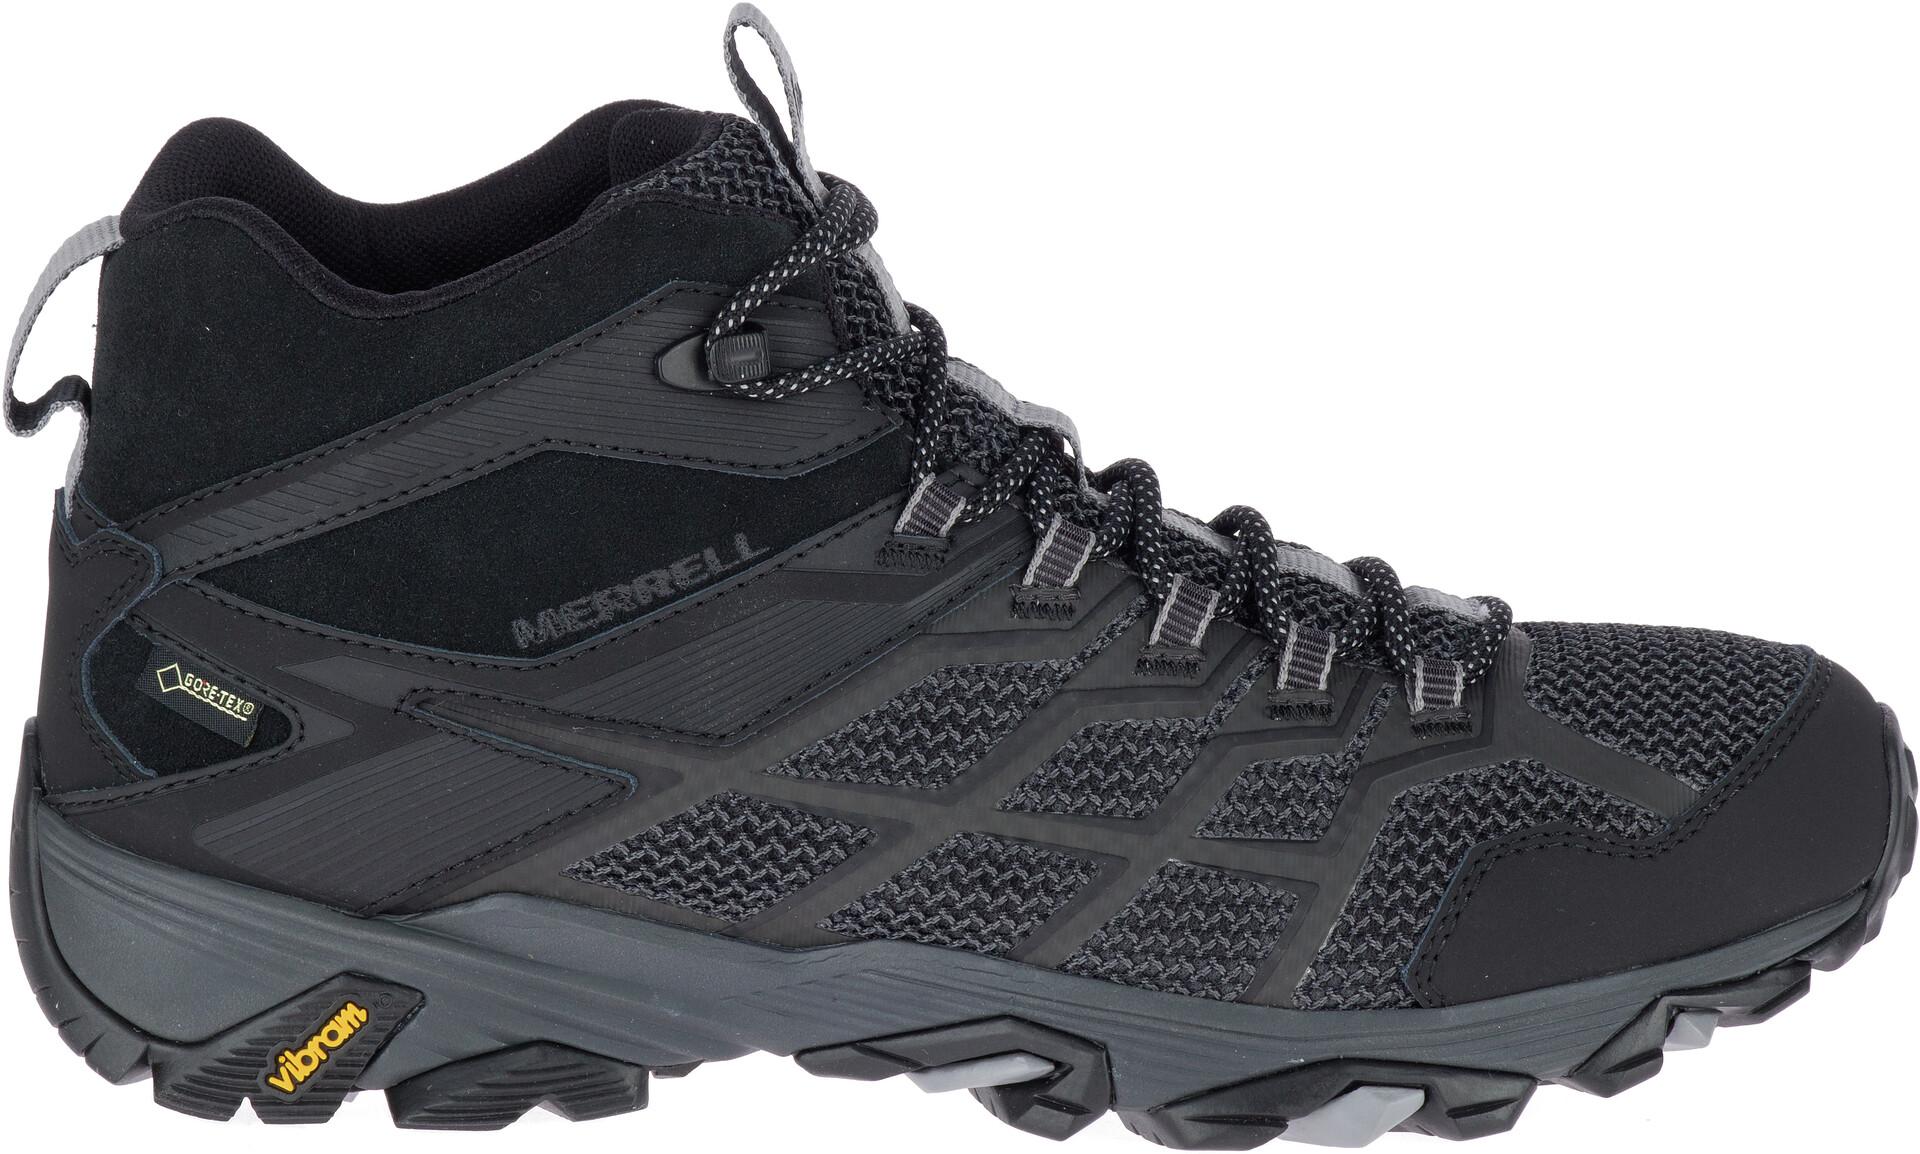 Merrell Moab FST 2 GTX Mid Cut Schuhe Herren all black